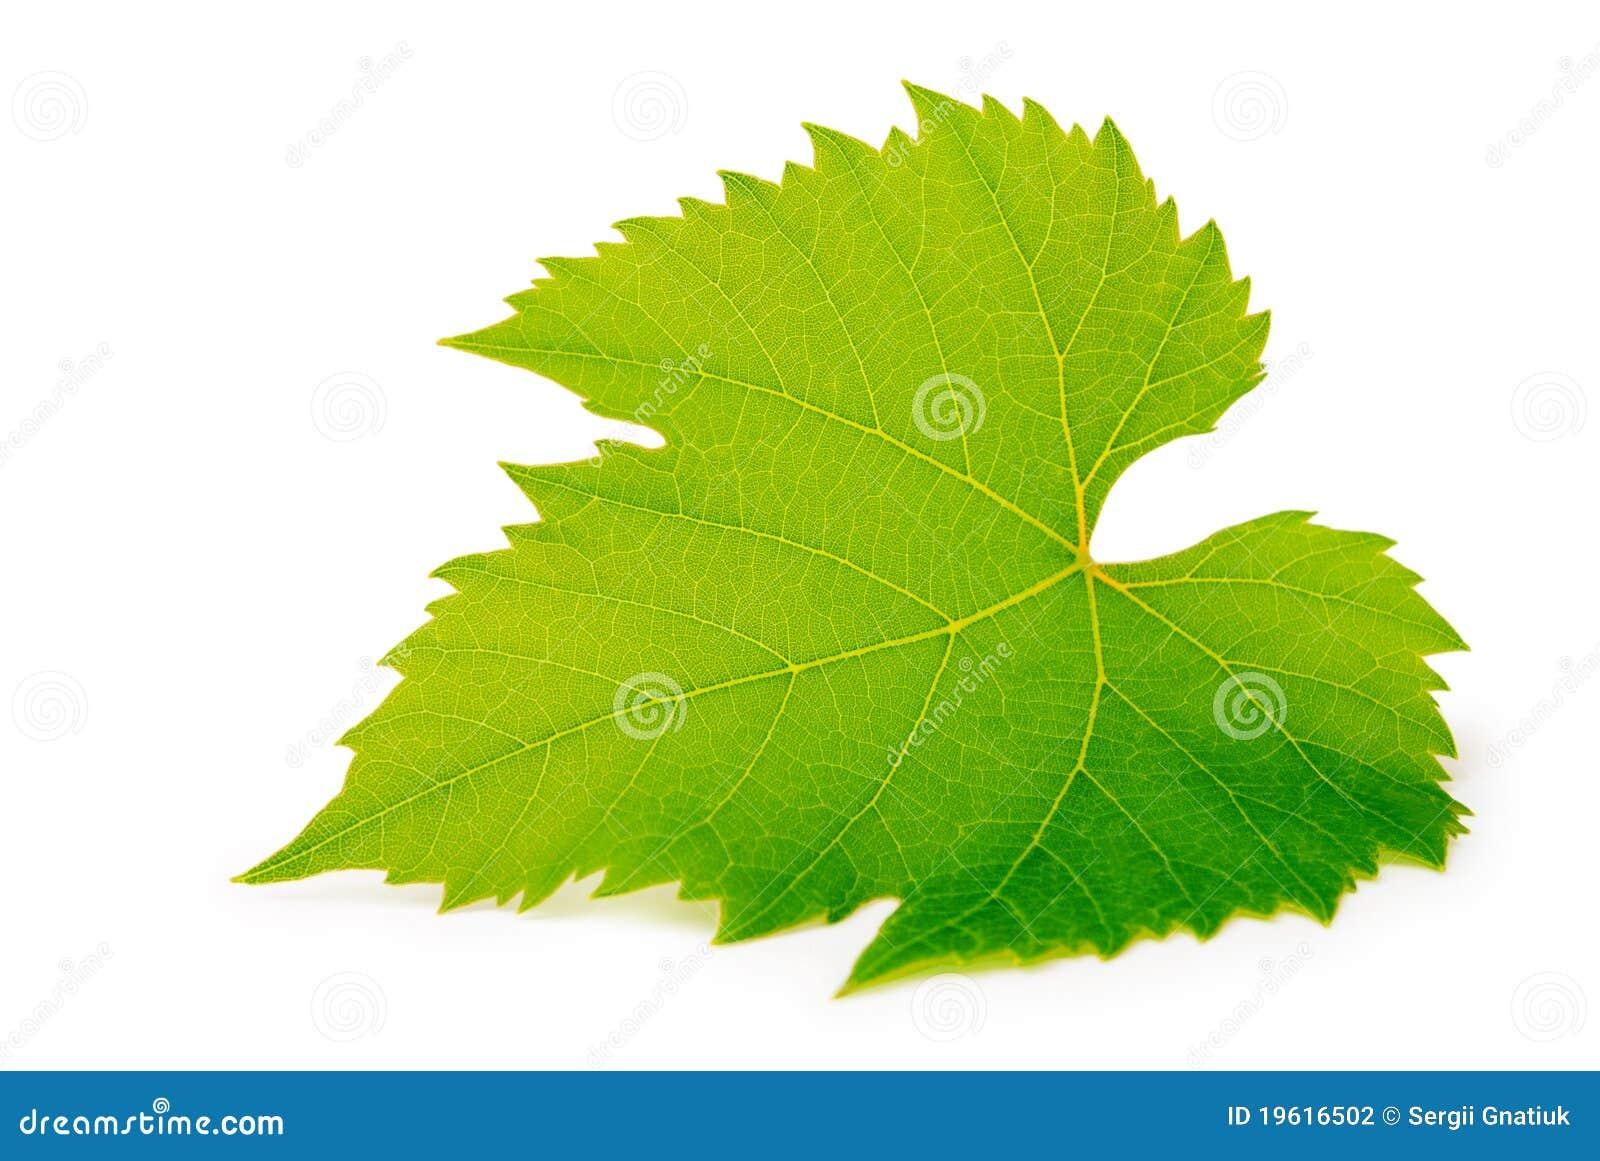 Download Grape leaf stock photo. Image of harvest, background - 19616502